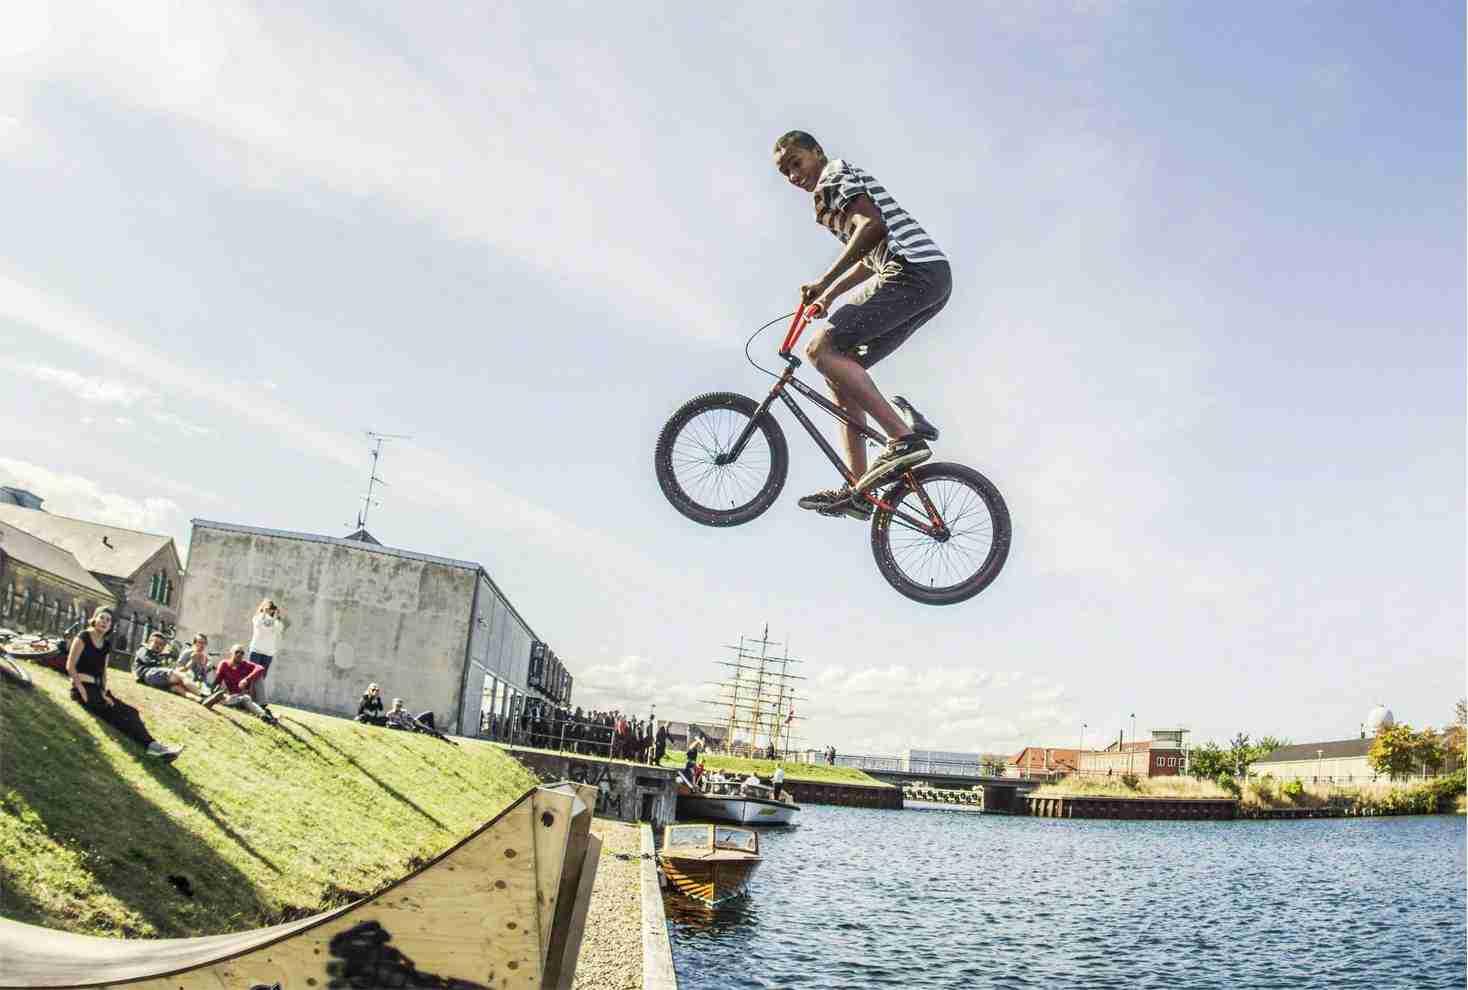 holmen-dirt-aktiviteter-dirtjump-bmx-pumptrack-rekreativ-social-friluftsliv-cykelleg-sikker-cyklist-København-Copenhagen-Christianshavn-cykel-dirt-jump-13